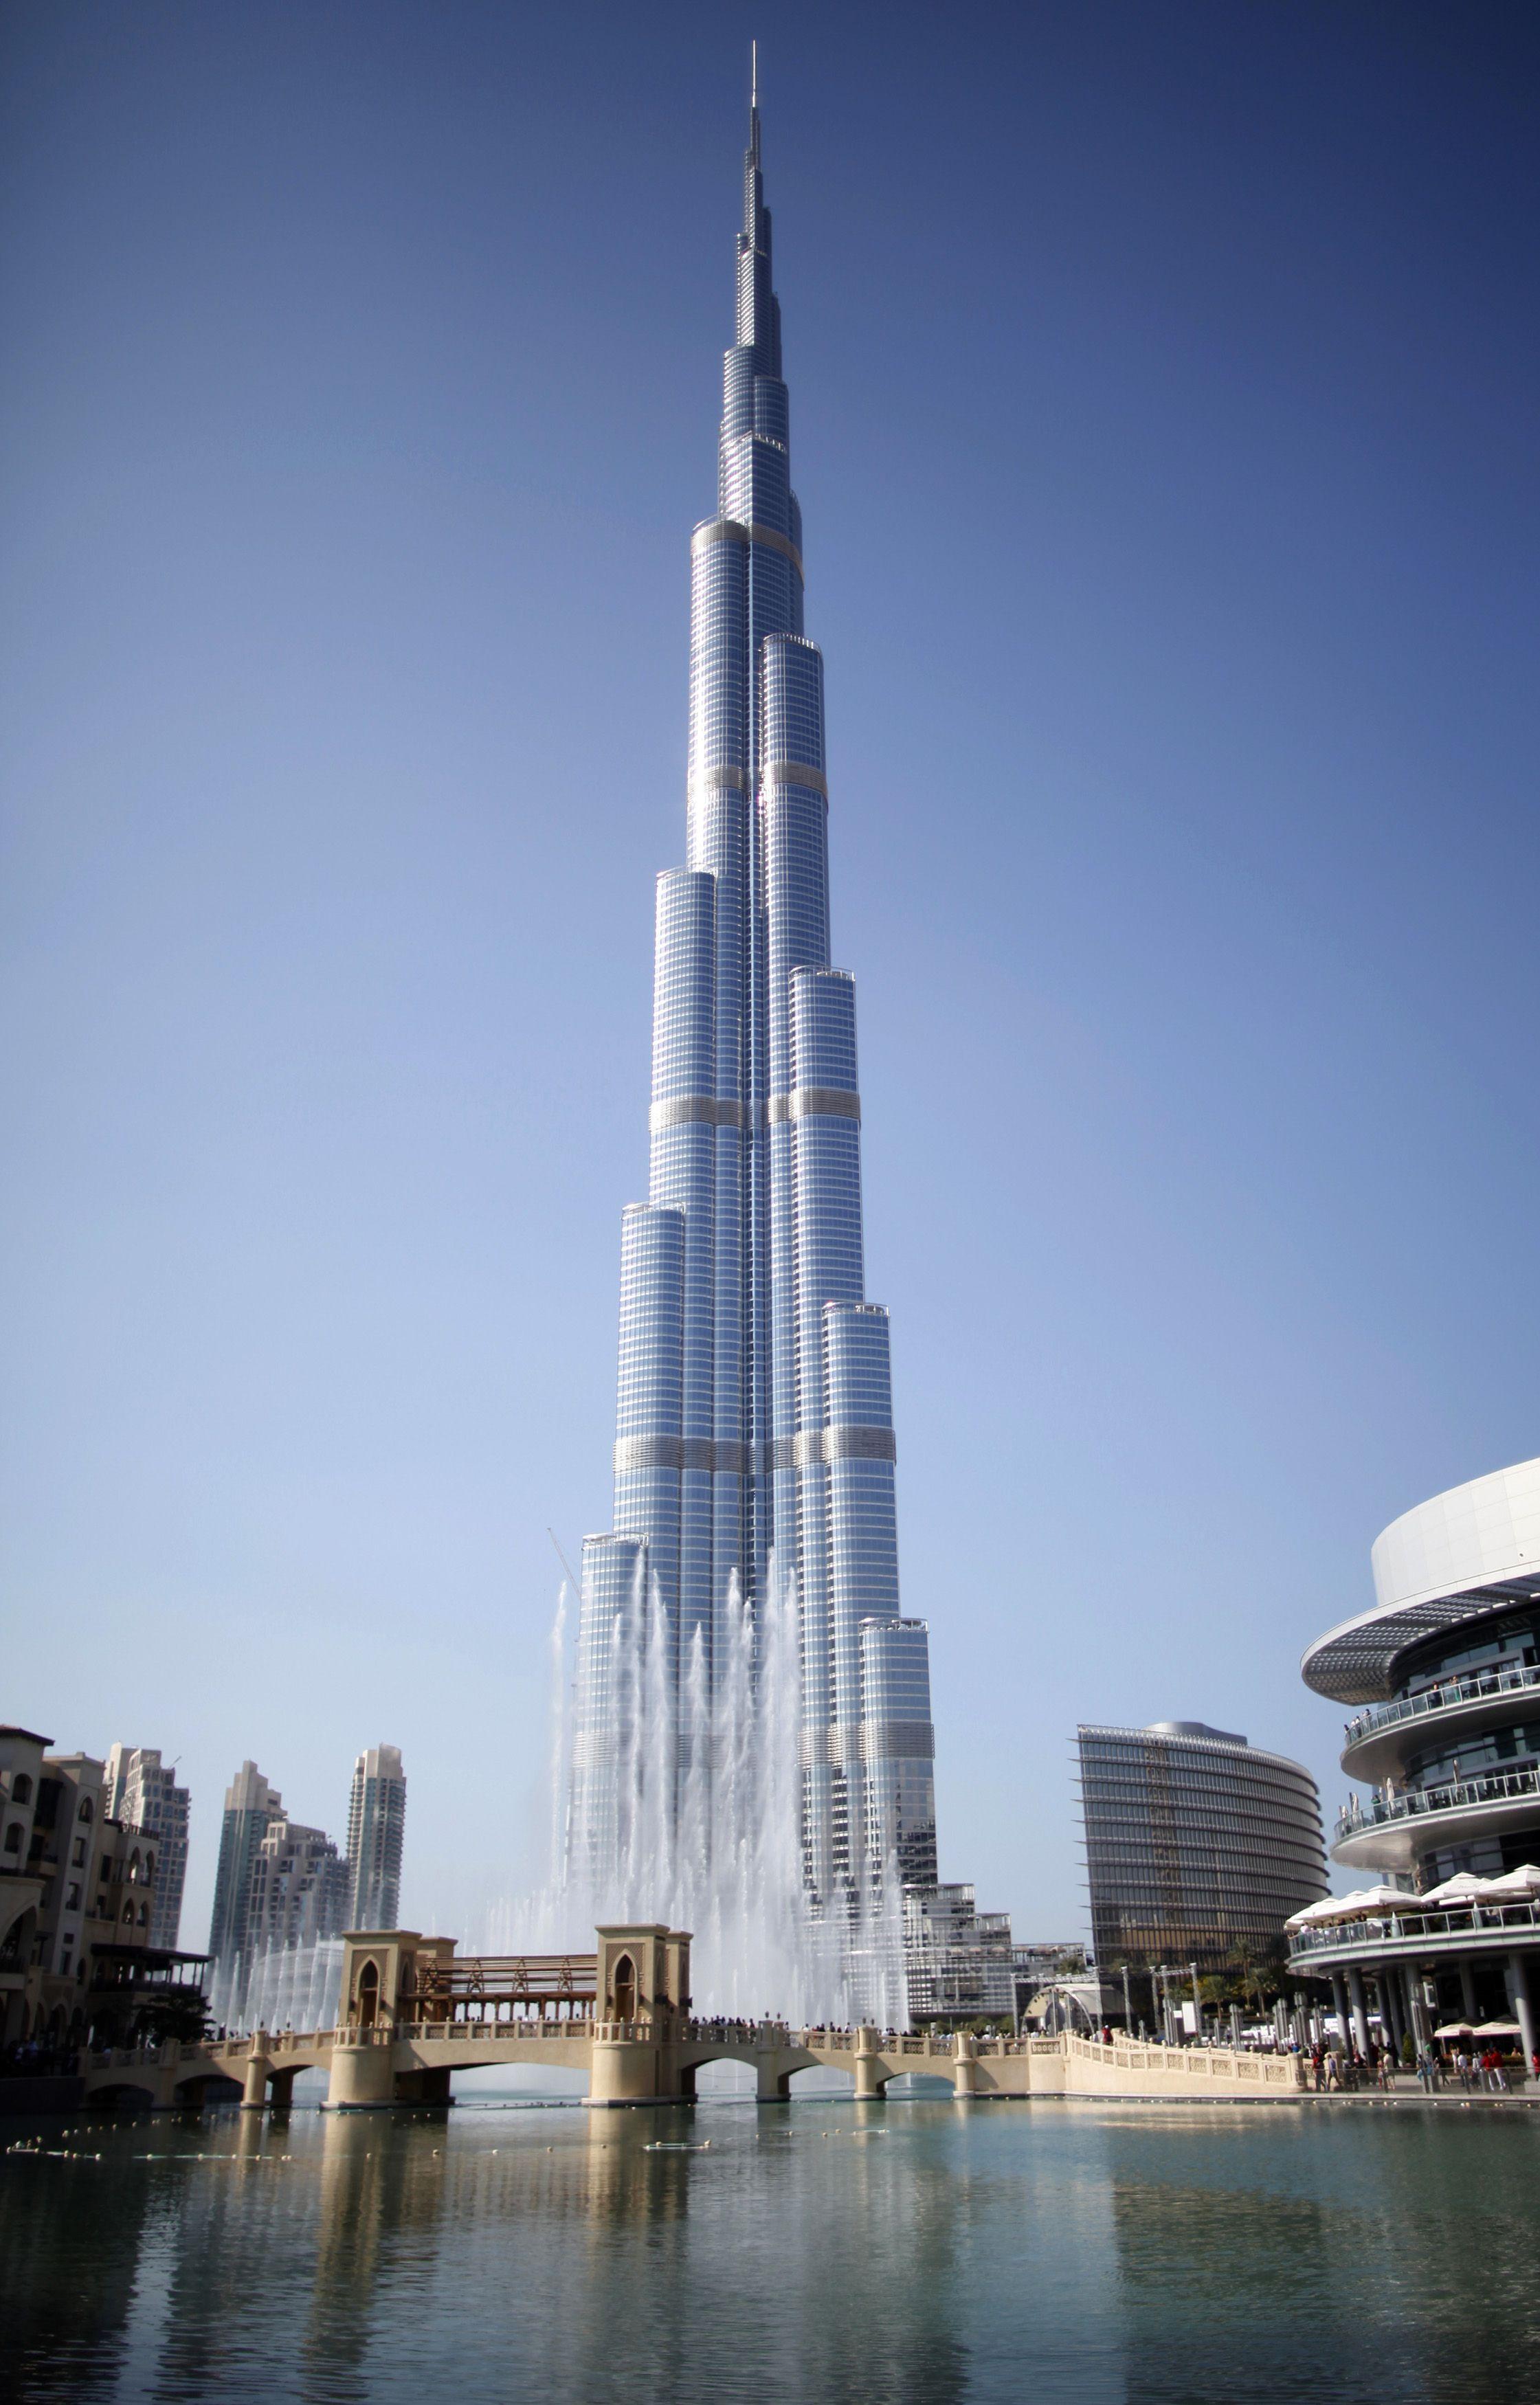 Burj khalifa de dub i es una enorme pir mide illuminati y for The burg hotel dubai